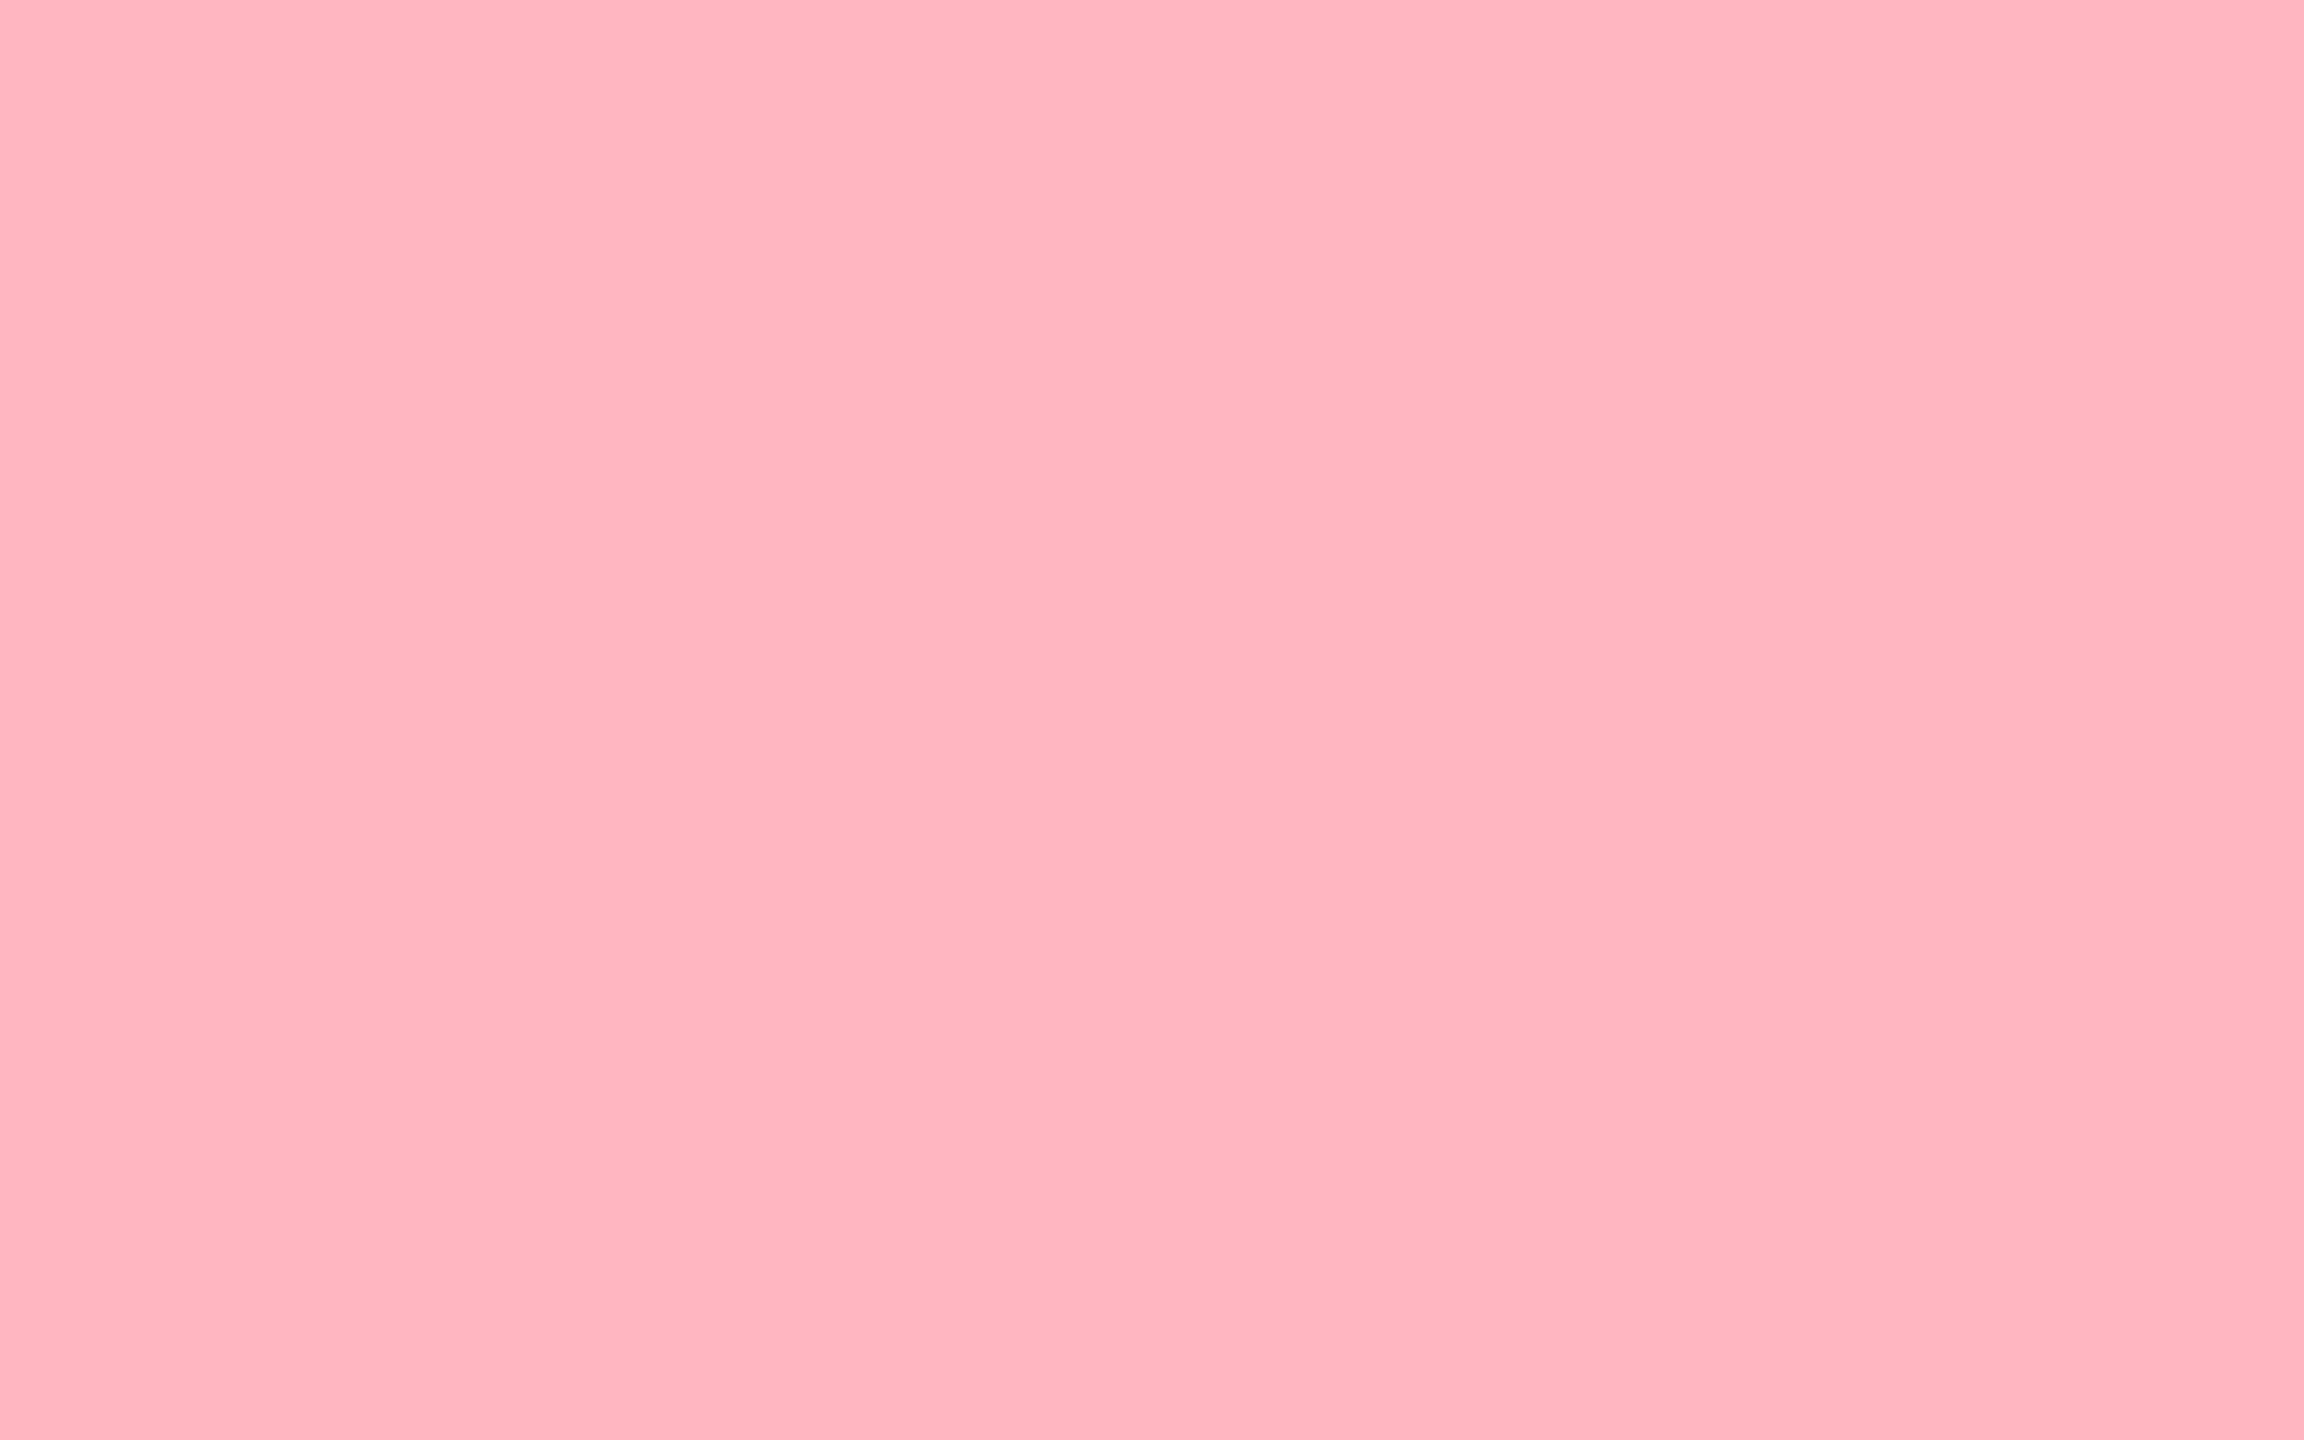 Moen Faucet Repair Kitchen Light Pink Color Background Light 28 Images Response